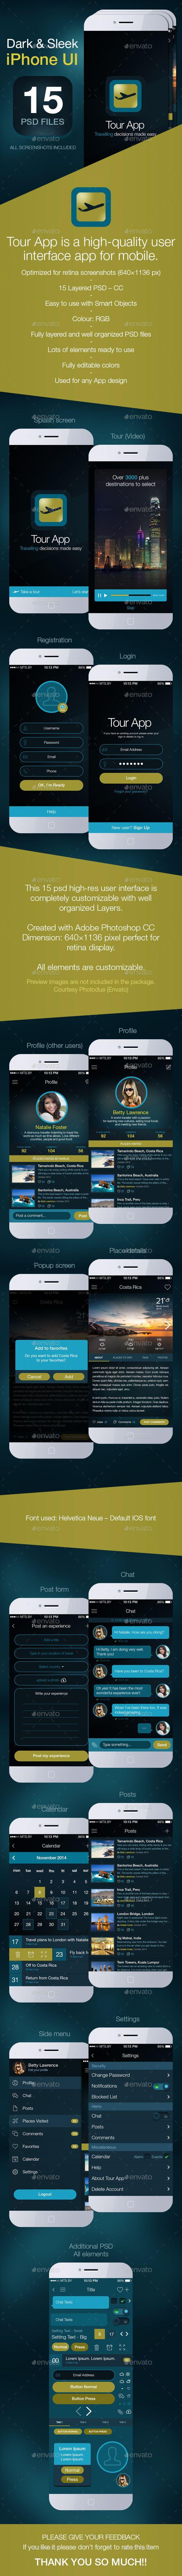 Tour App-Phone App UI